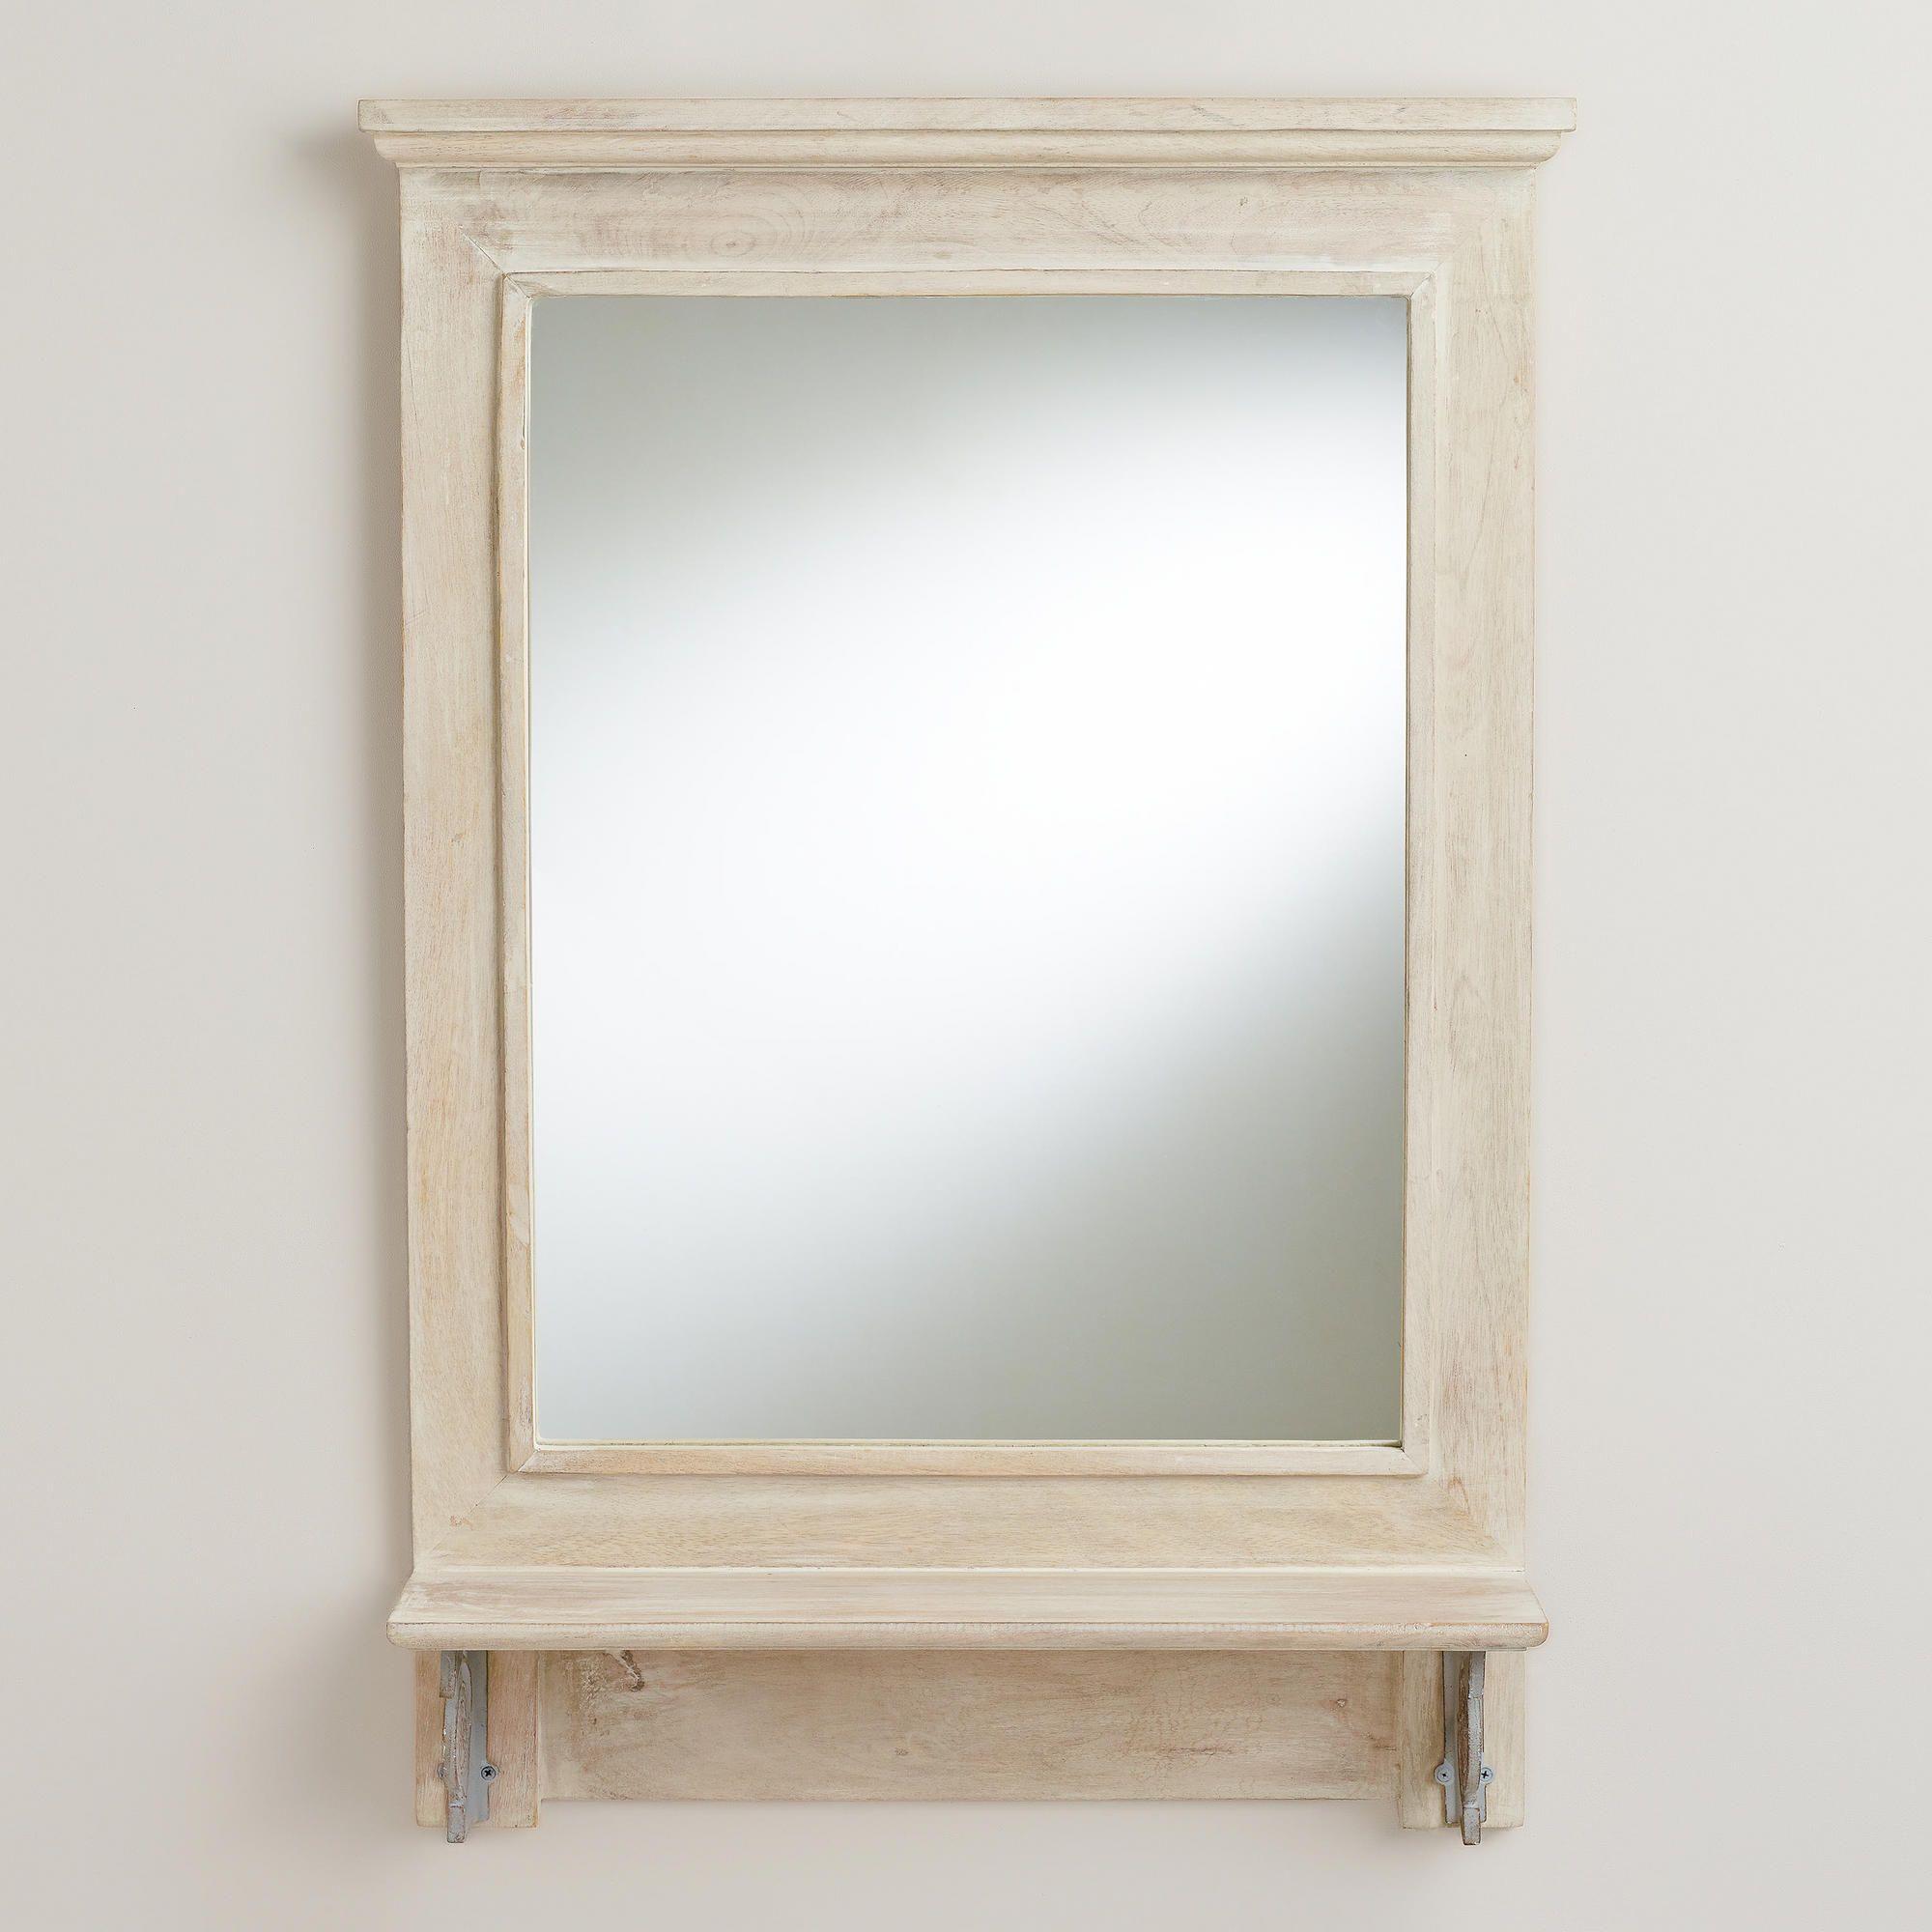 Carter Shelf Wall Mirror Mirror wall bedroom, Mirror